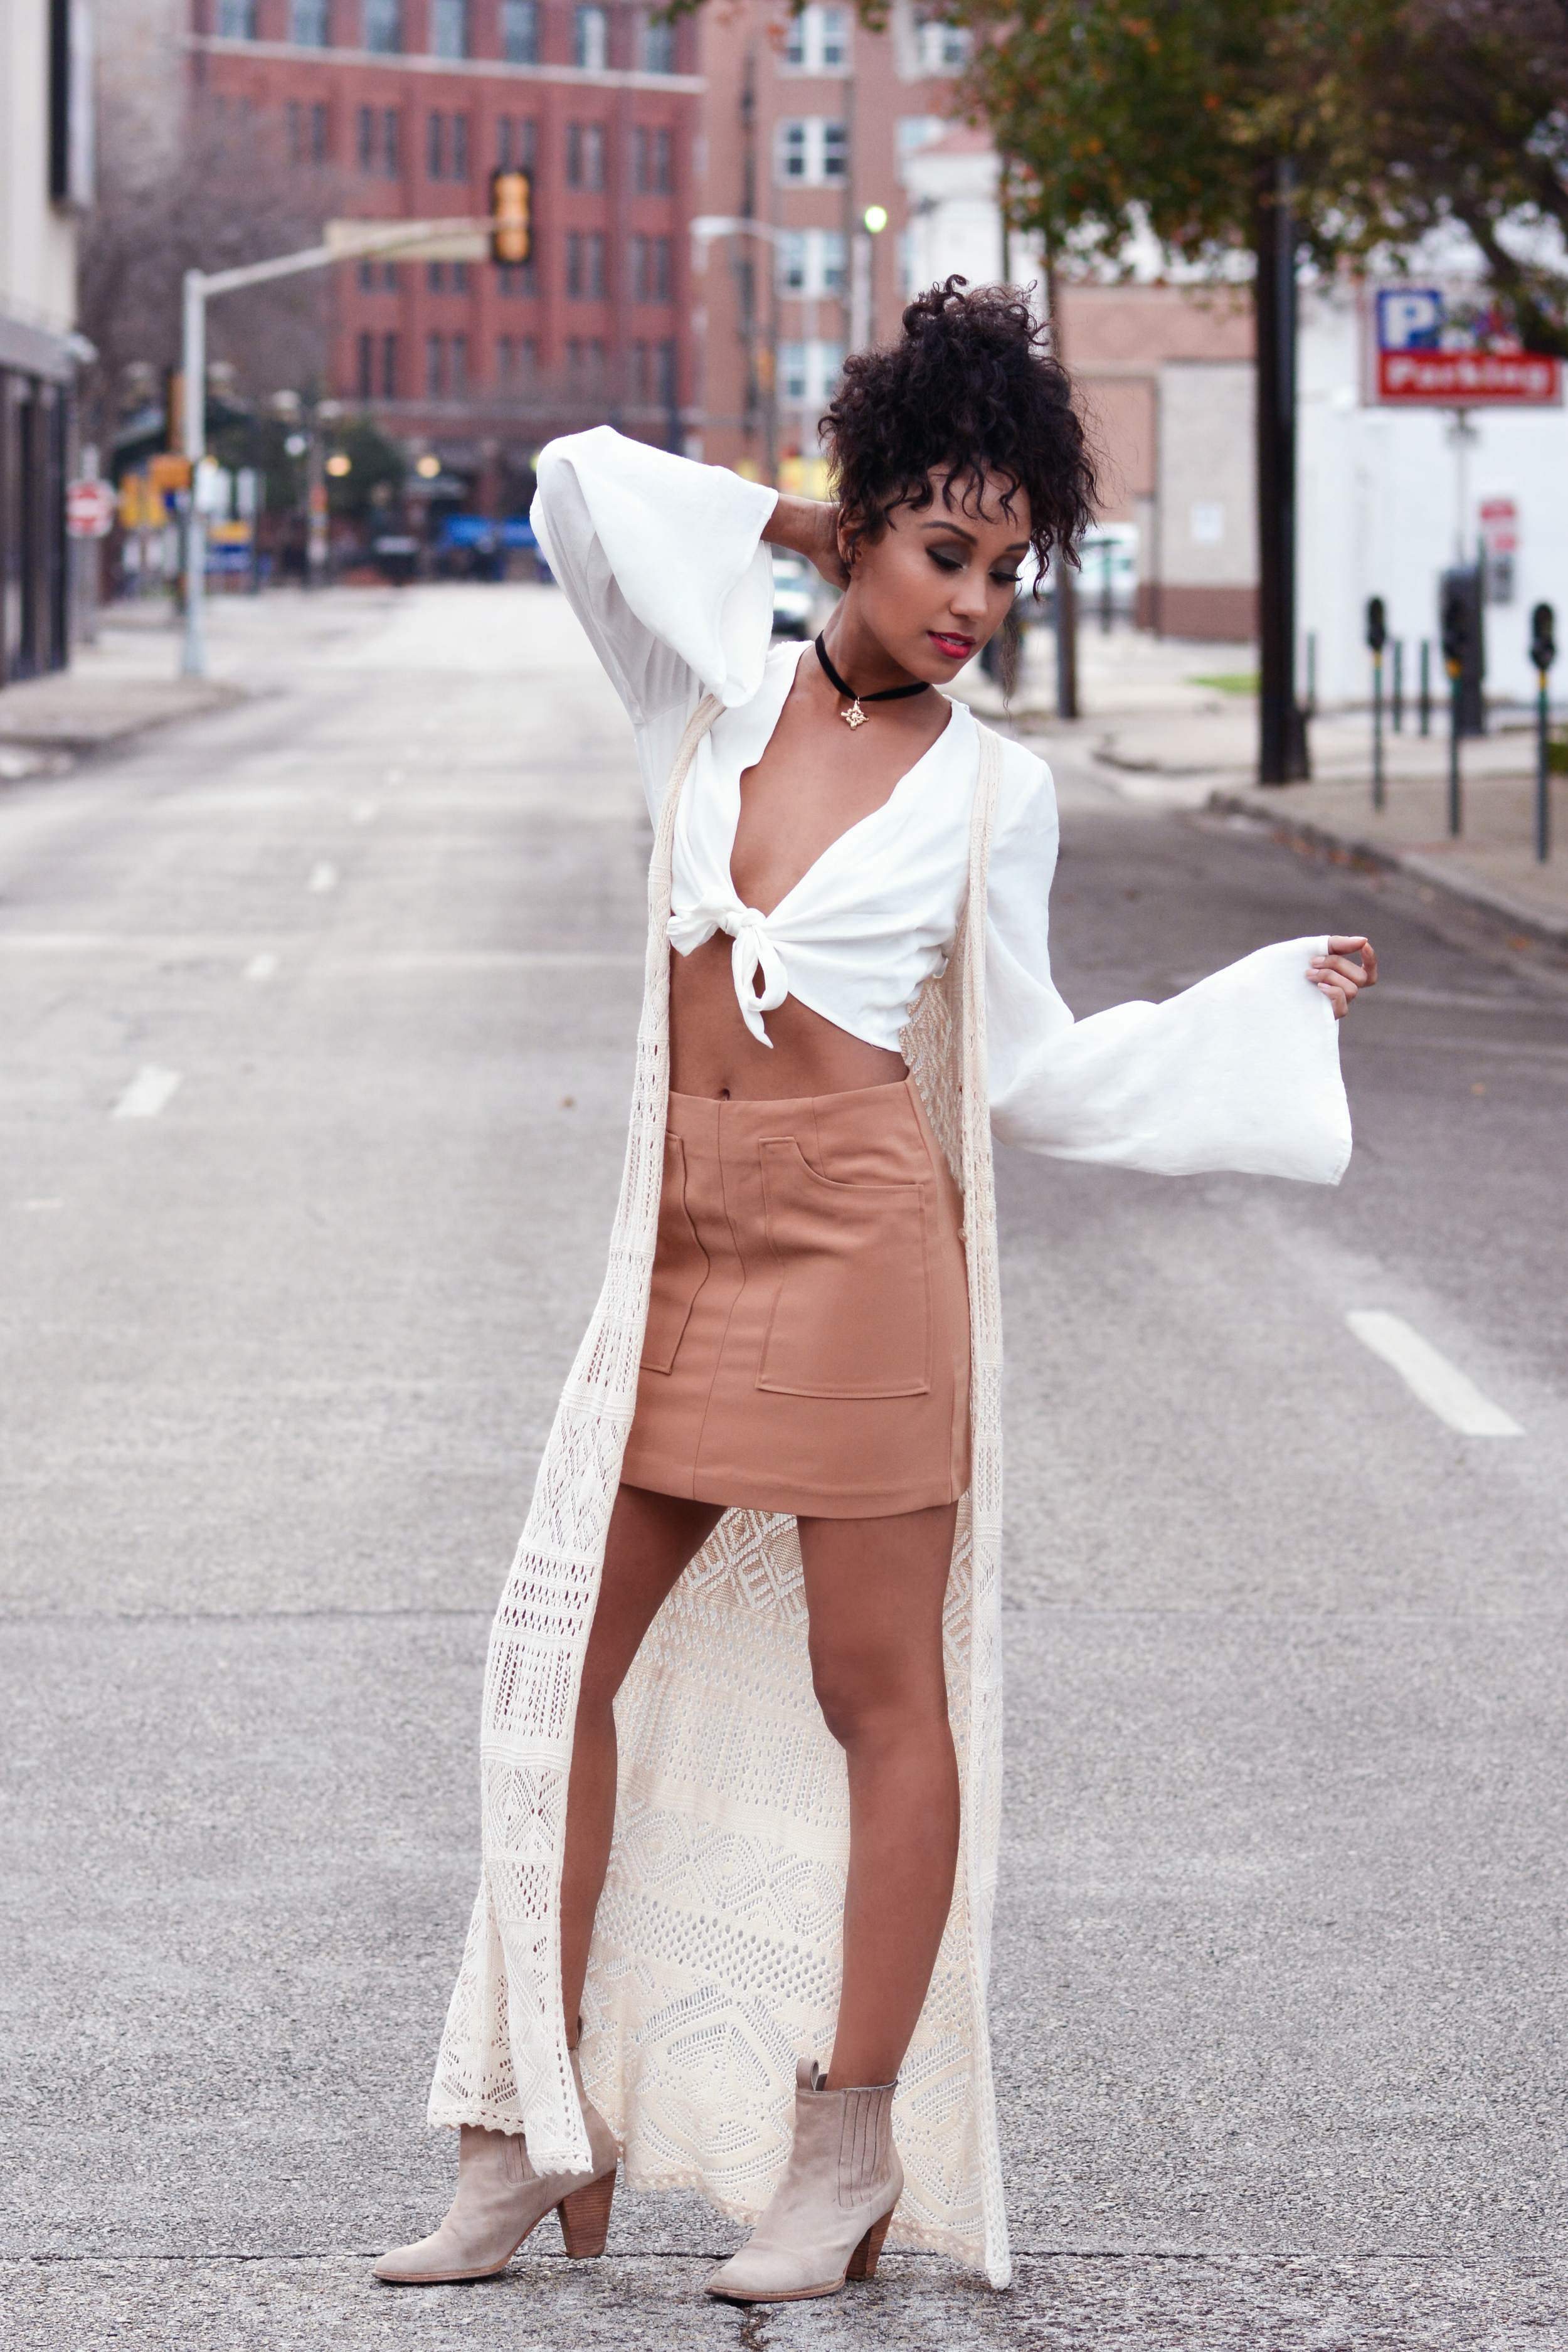 Alexis-70s-Fashion-Spring-16--2.jpg